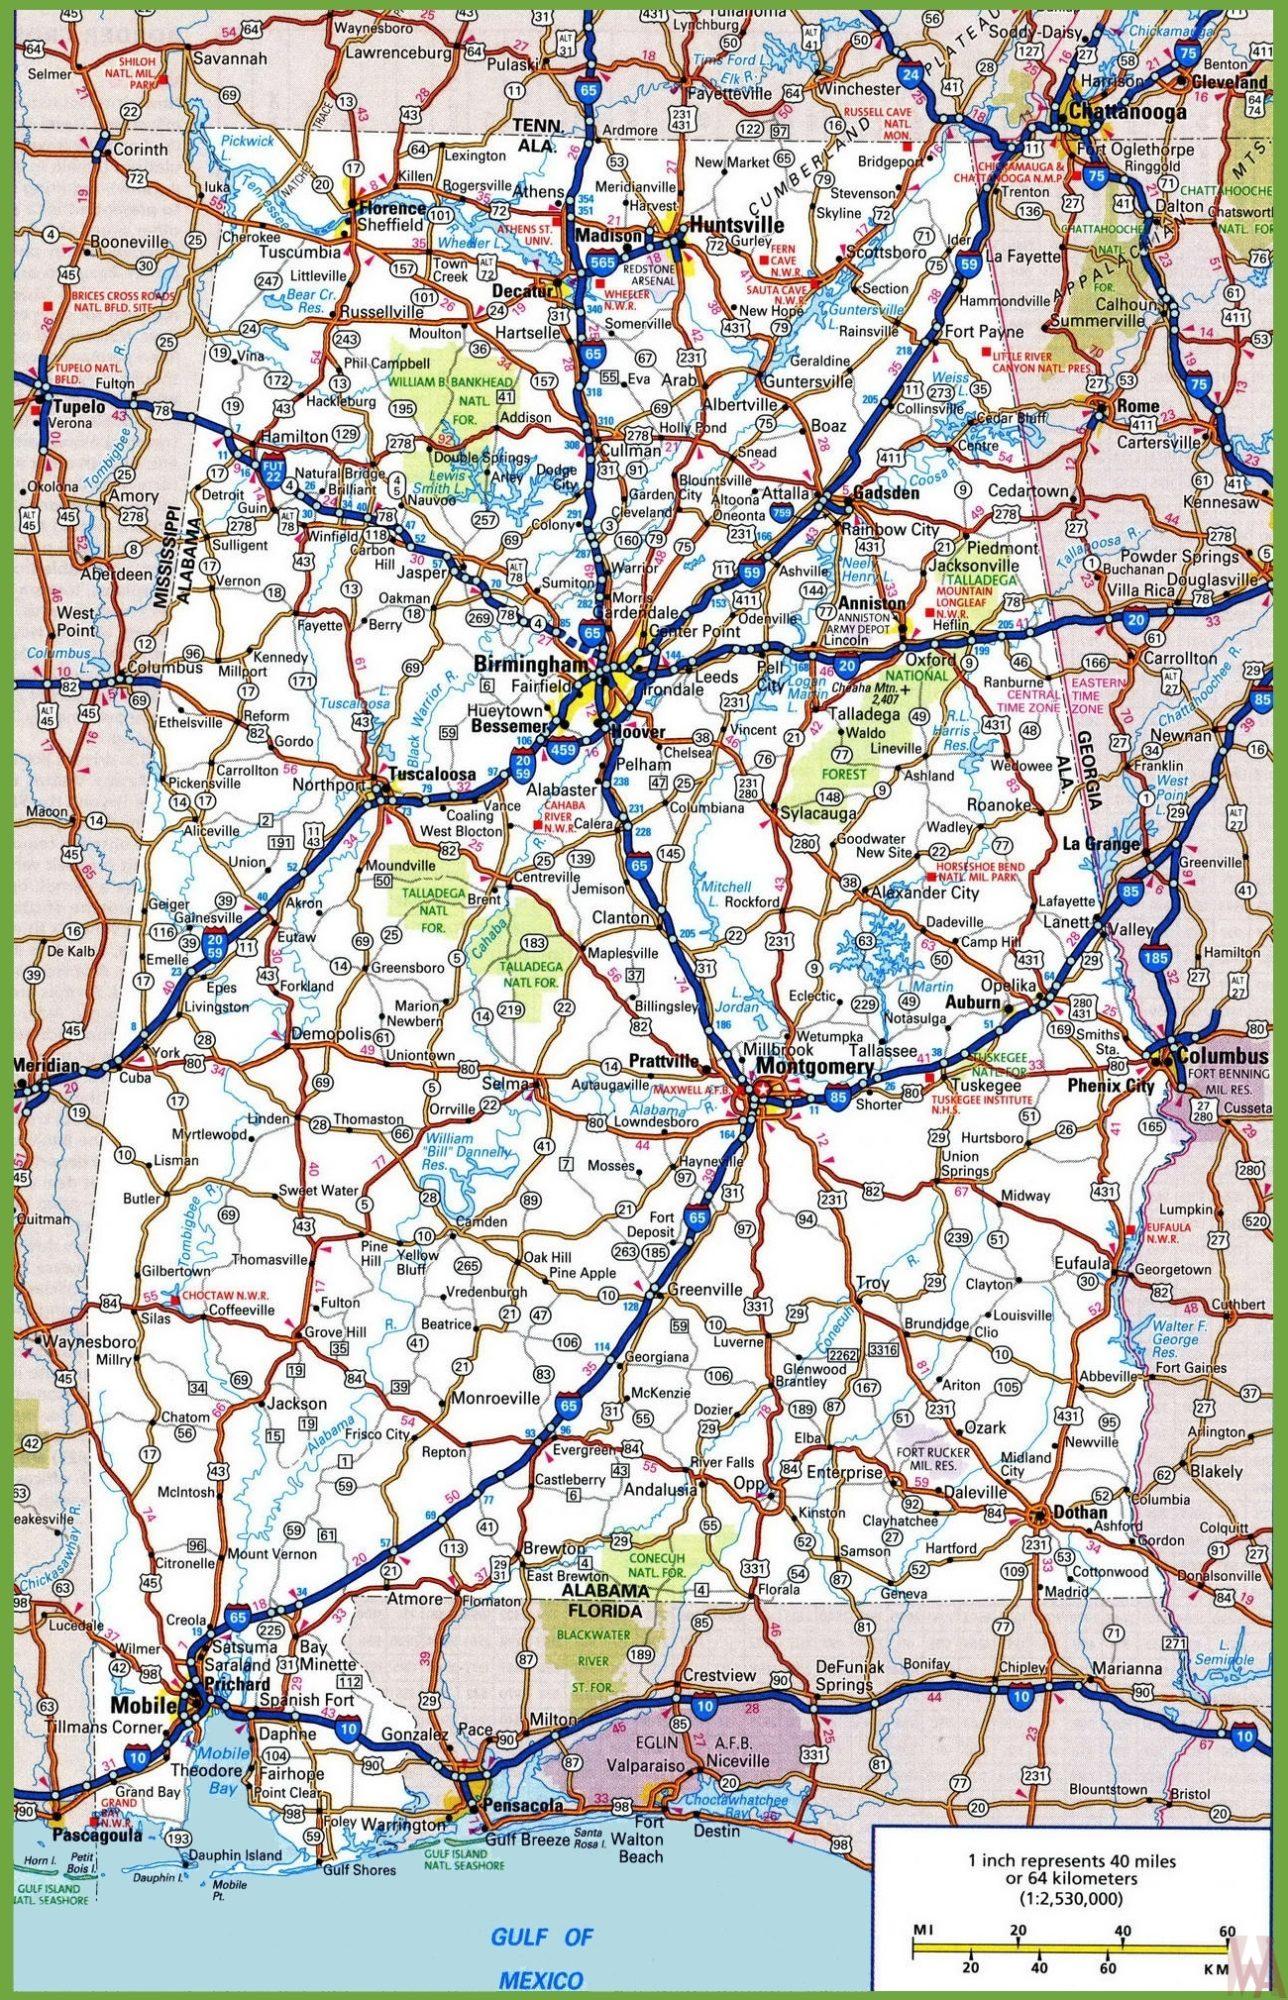 Alabama Road  Map |  Road  Map of Alabama High Resolution